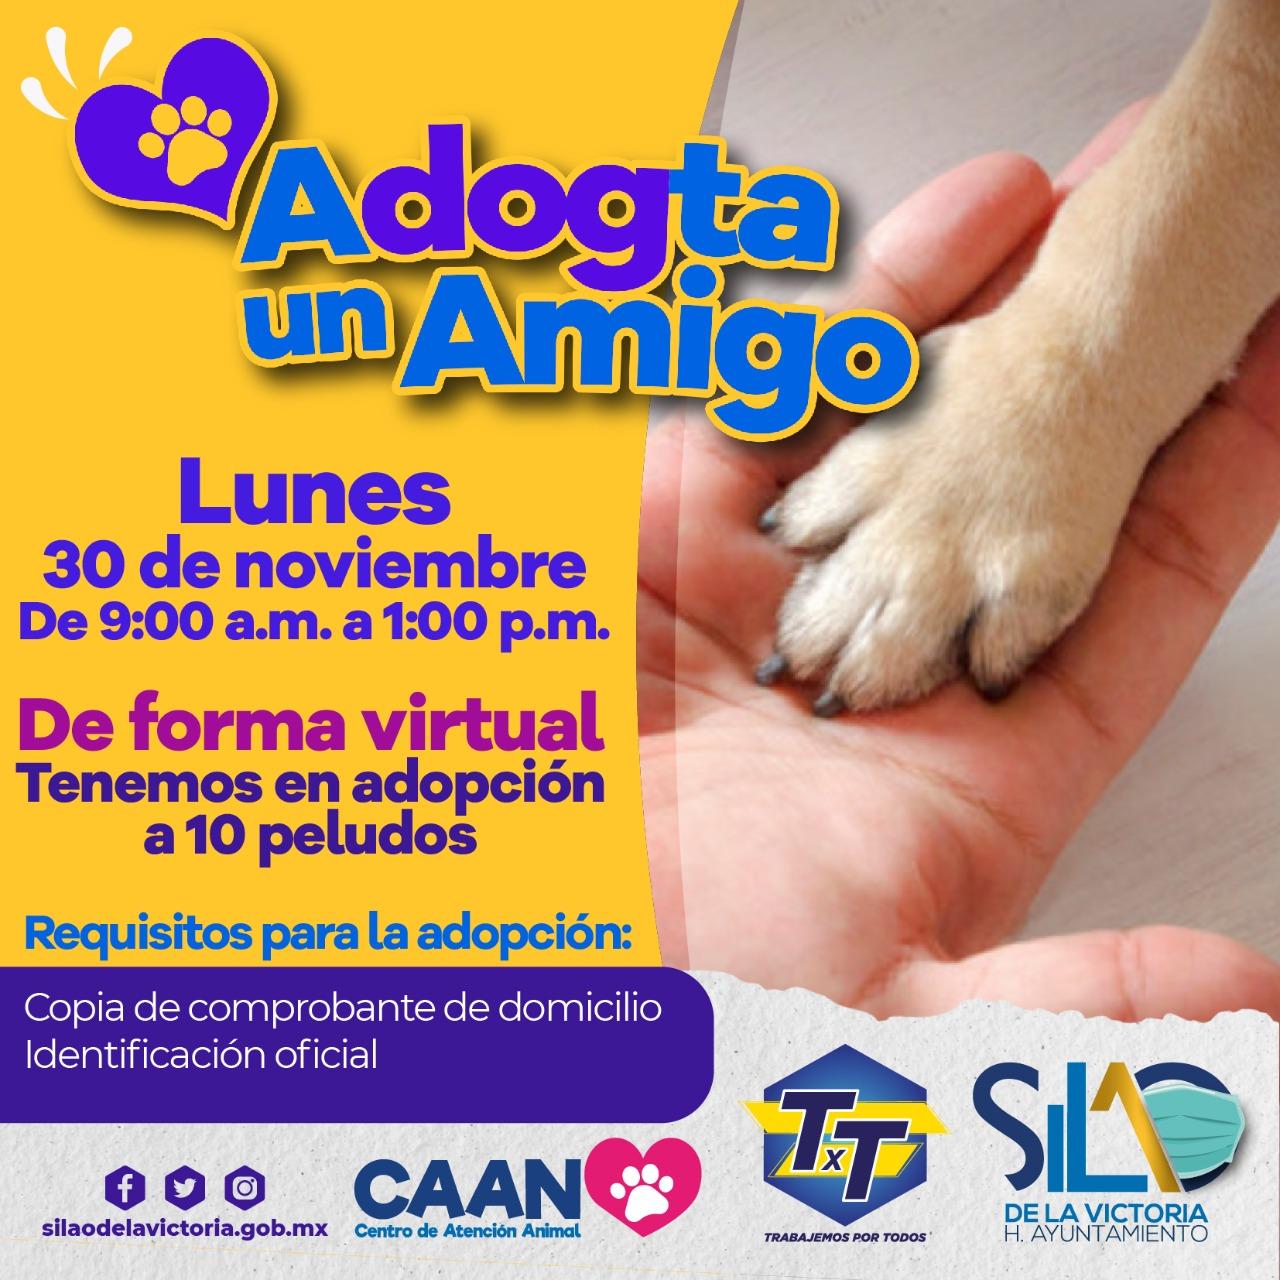 Invitan a participar en campaña de adopción canina